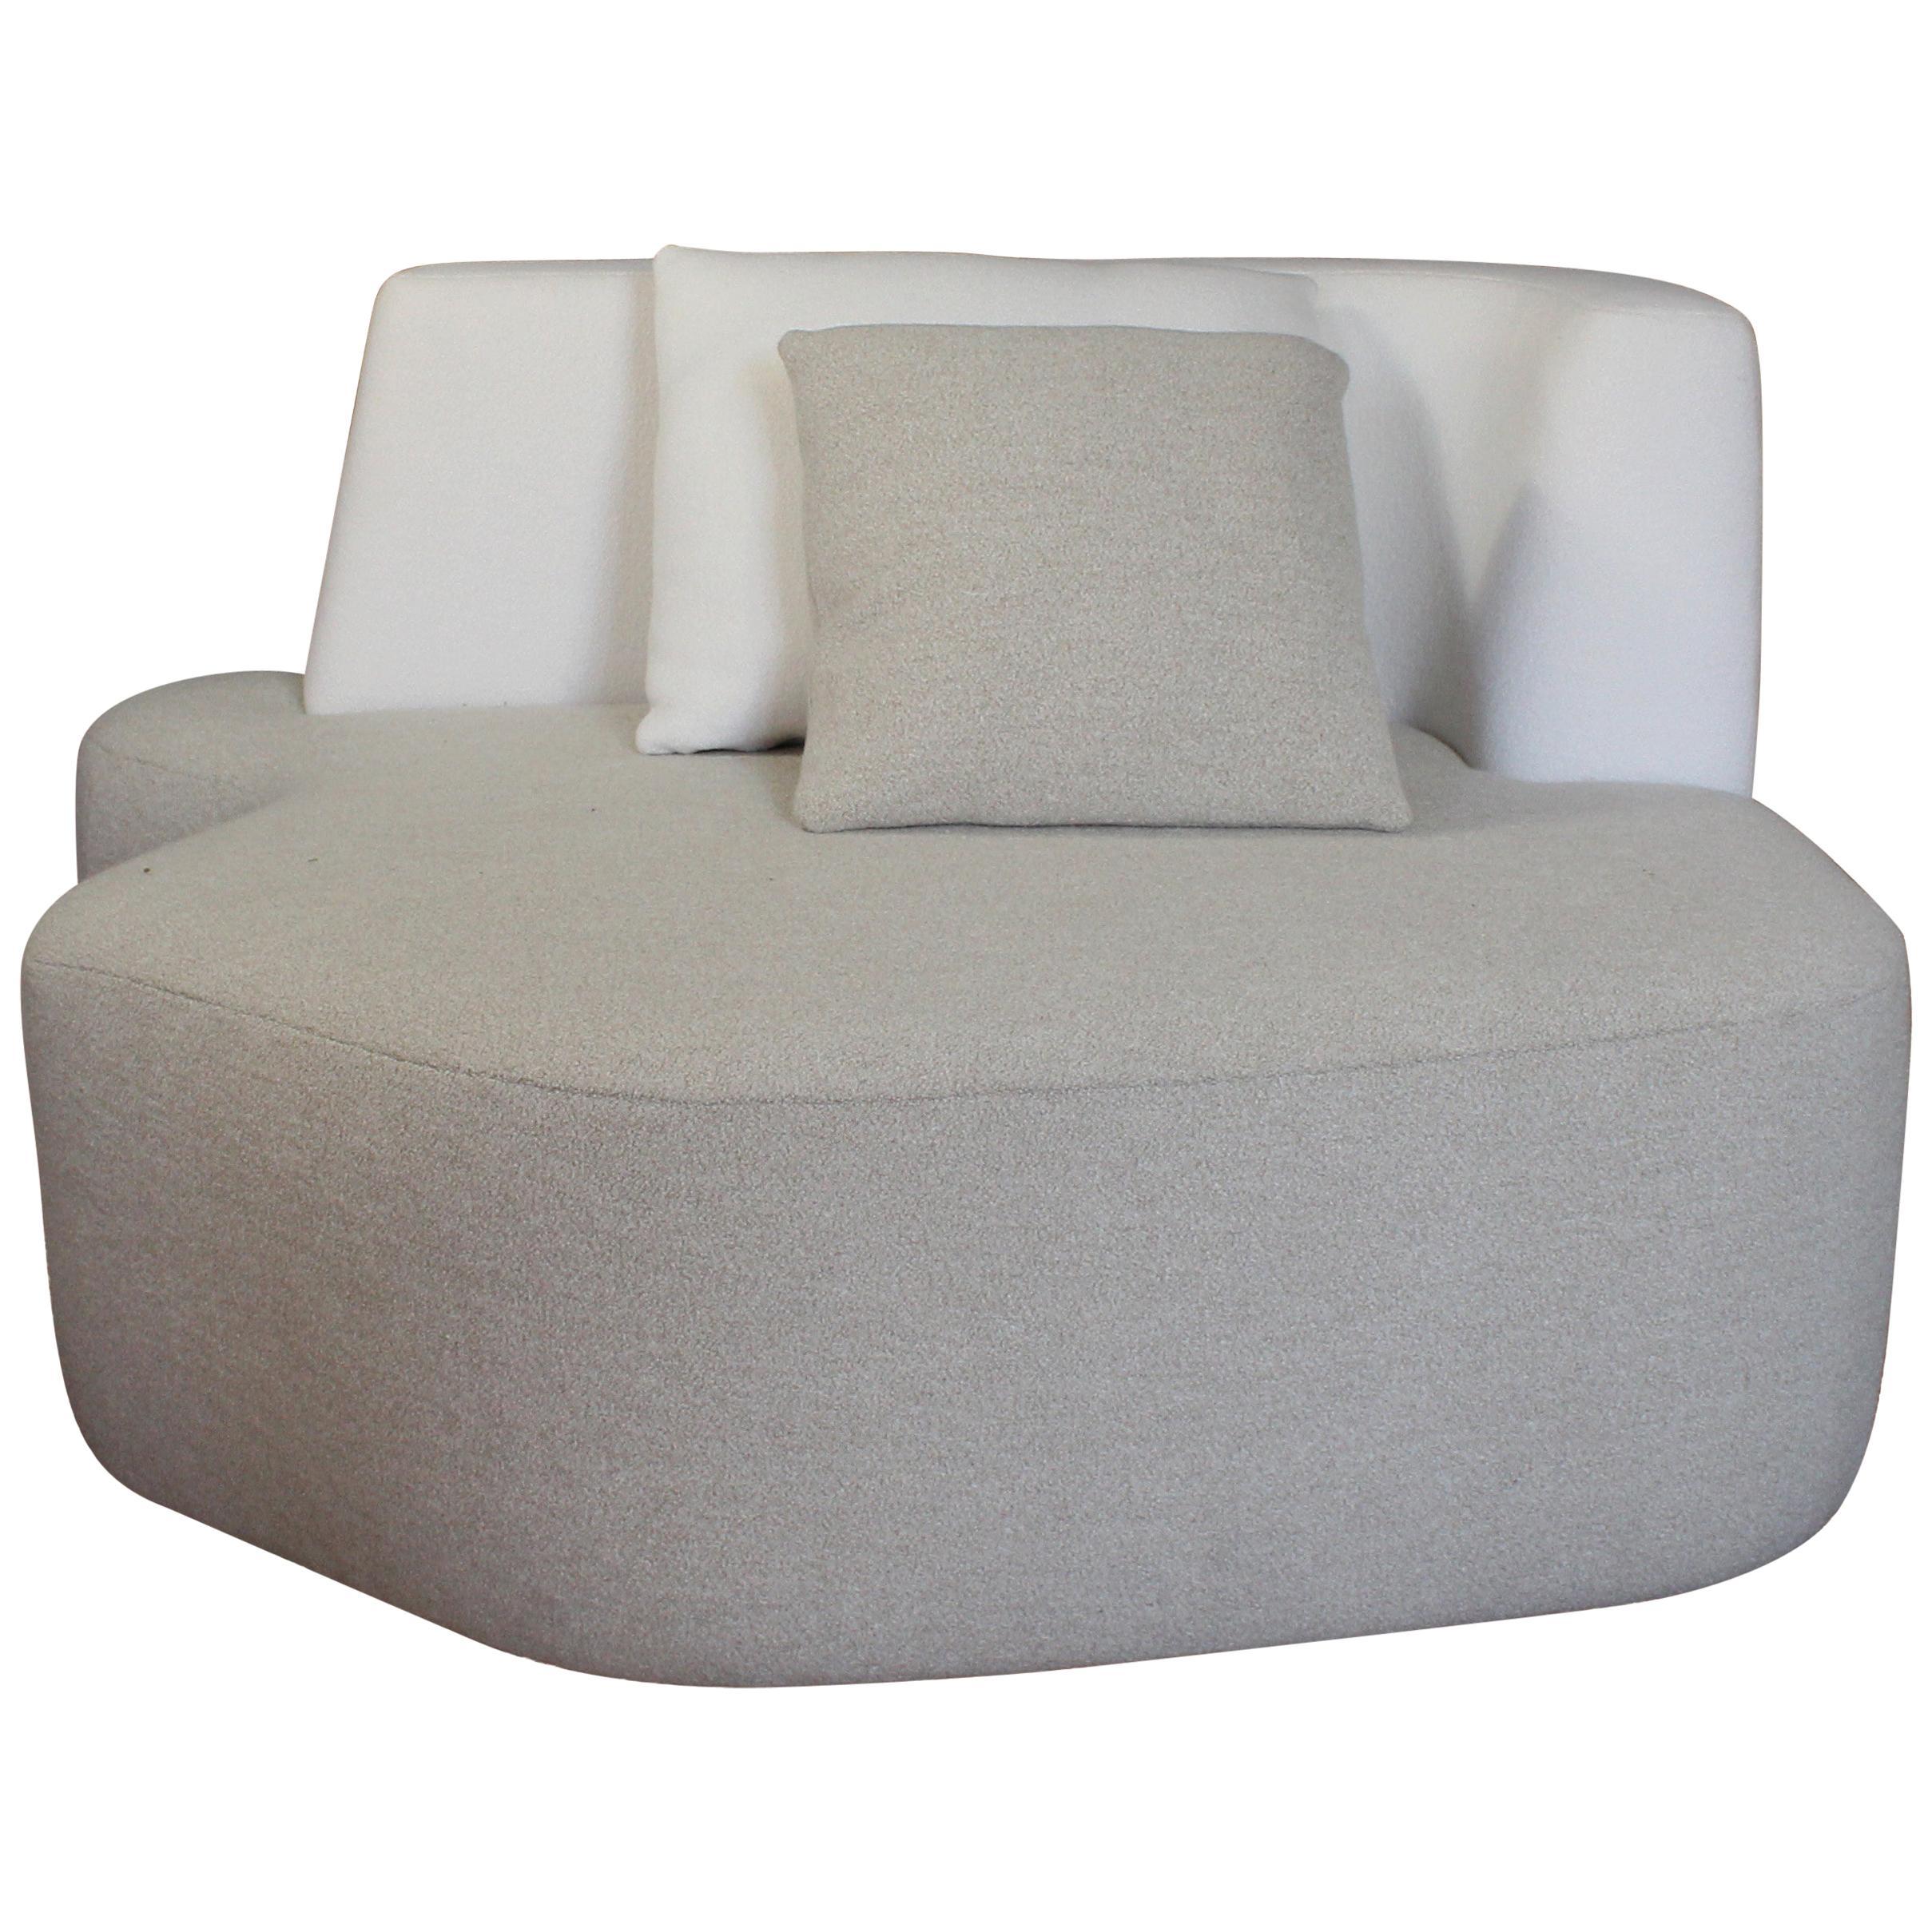 Organic Sofa Pierre in White and Cream Wool